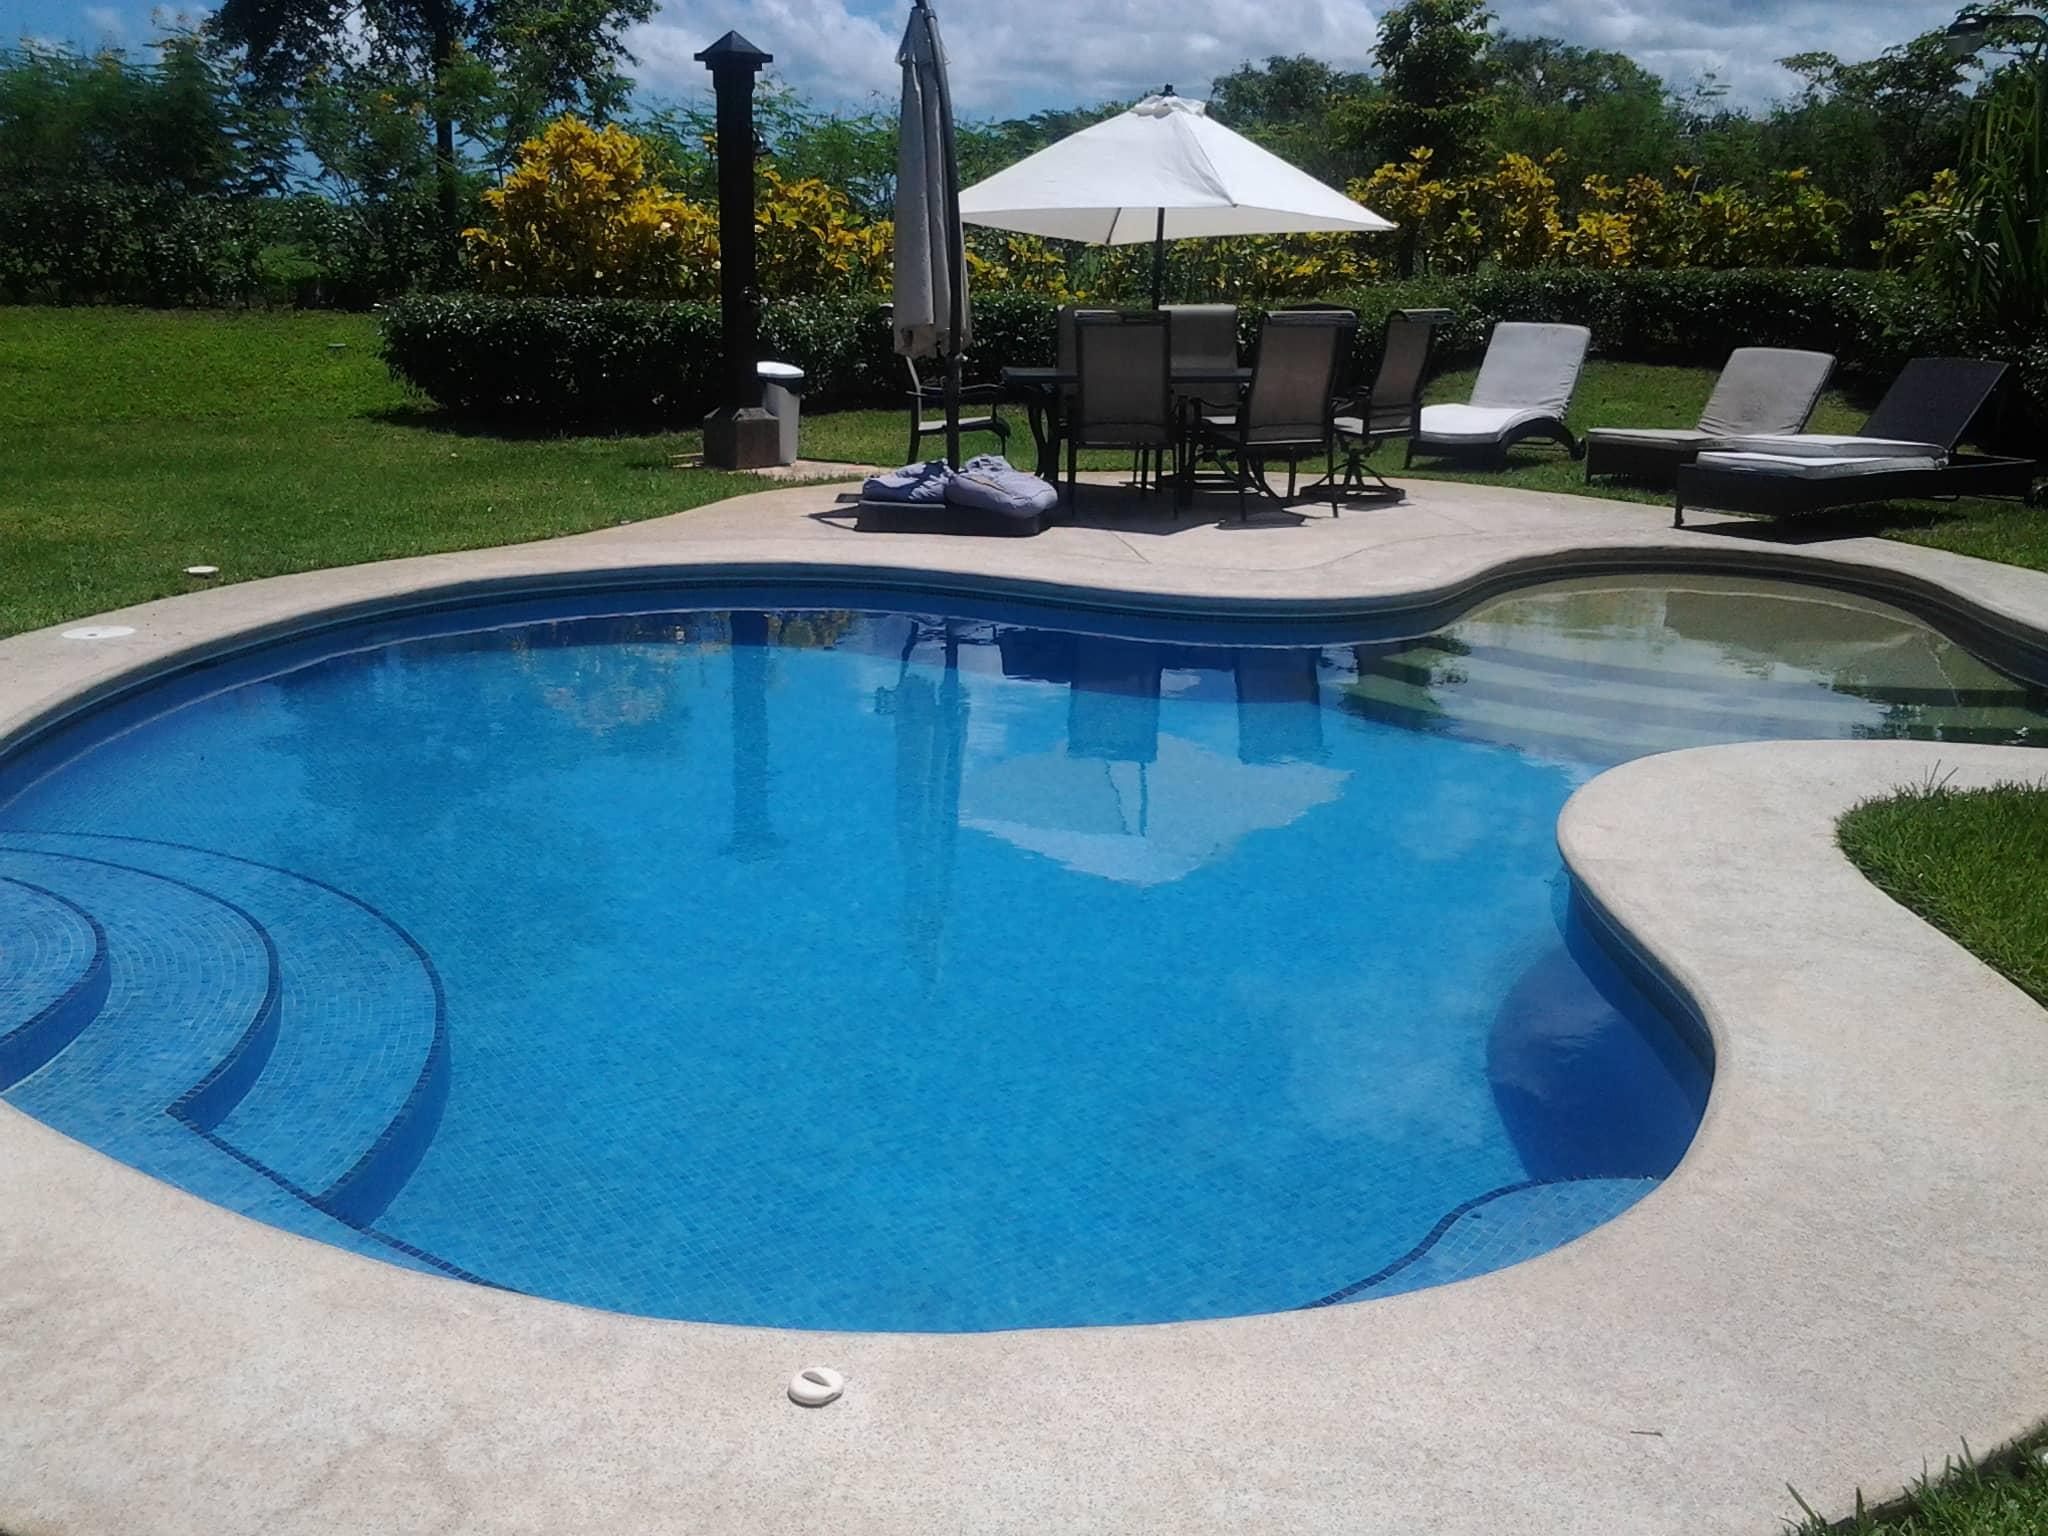 Construcci n dr pool service piscinas costa rica - Coste construccion piscina ...